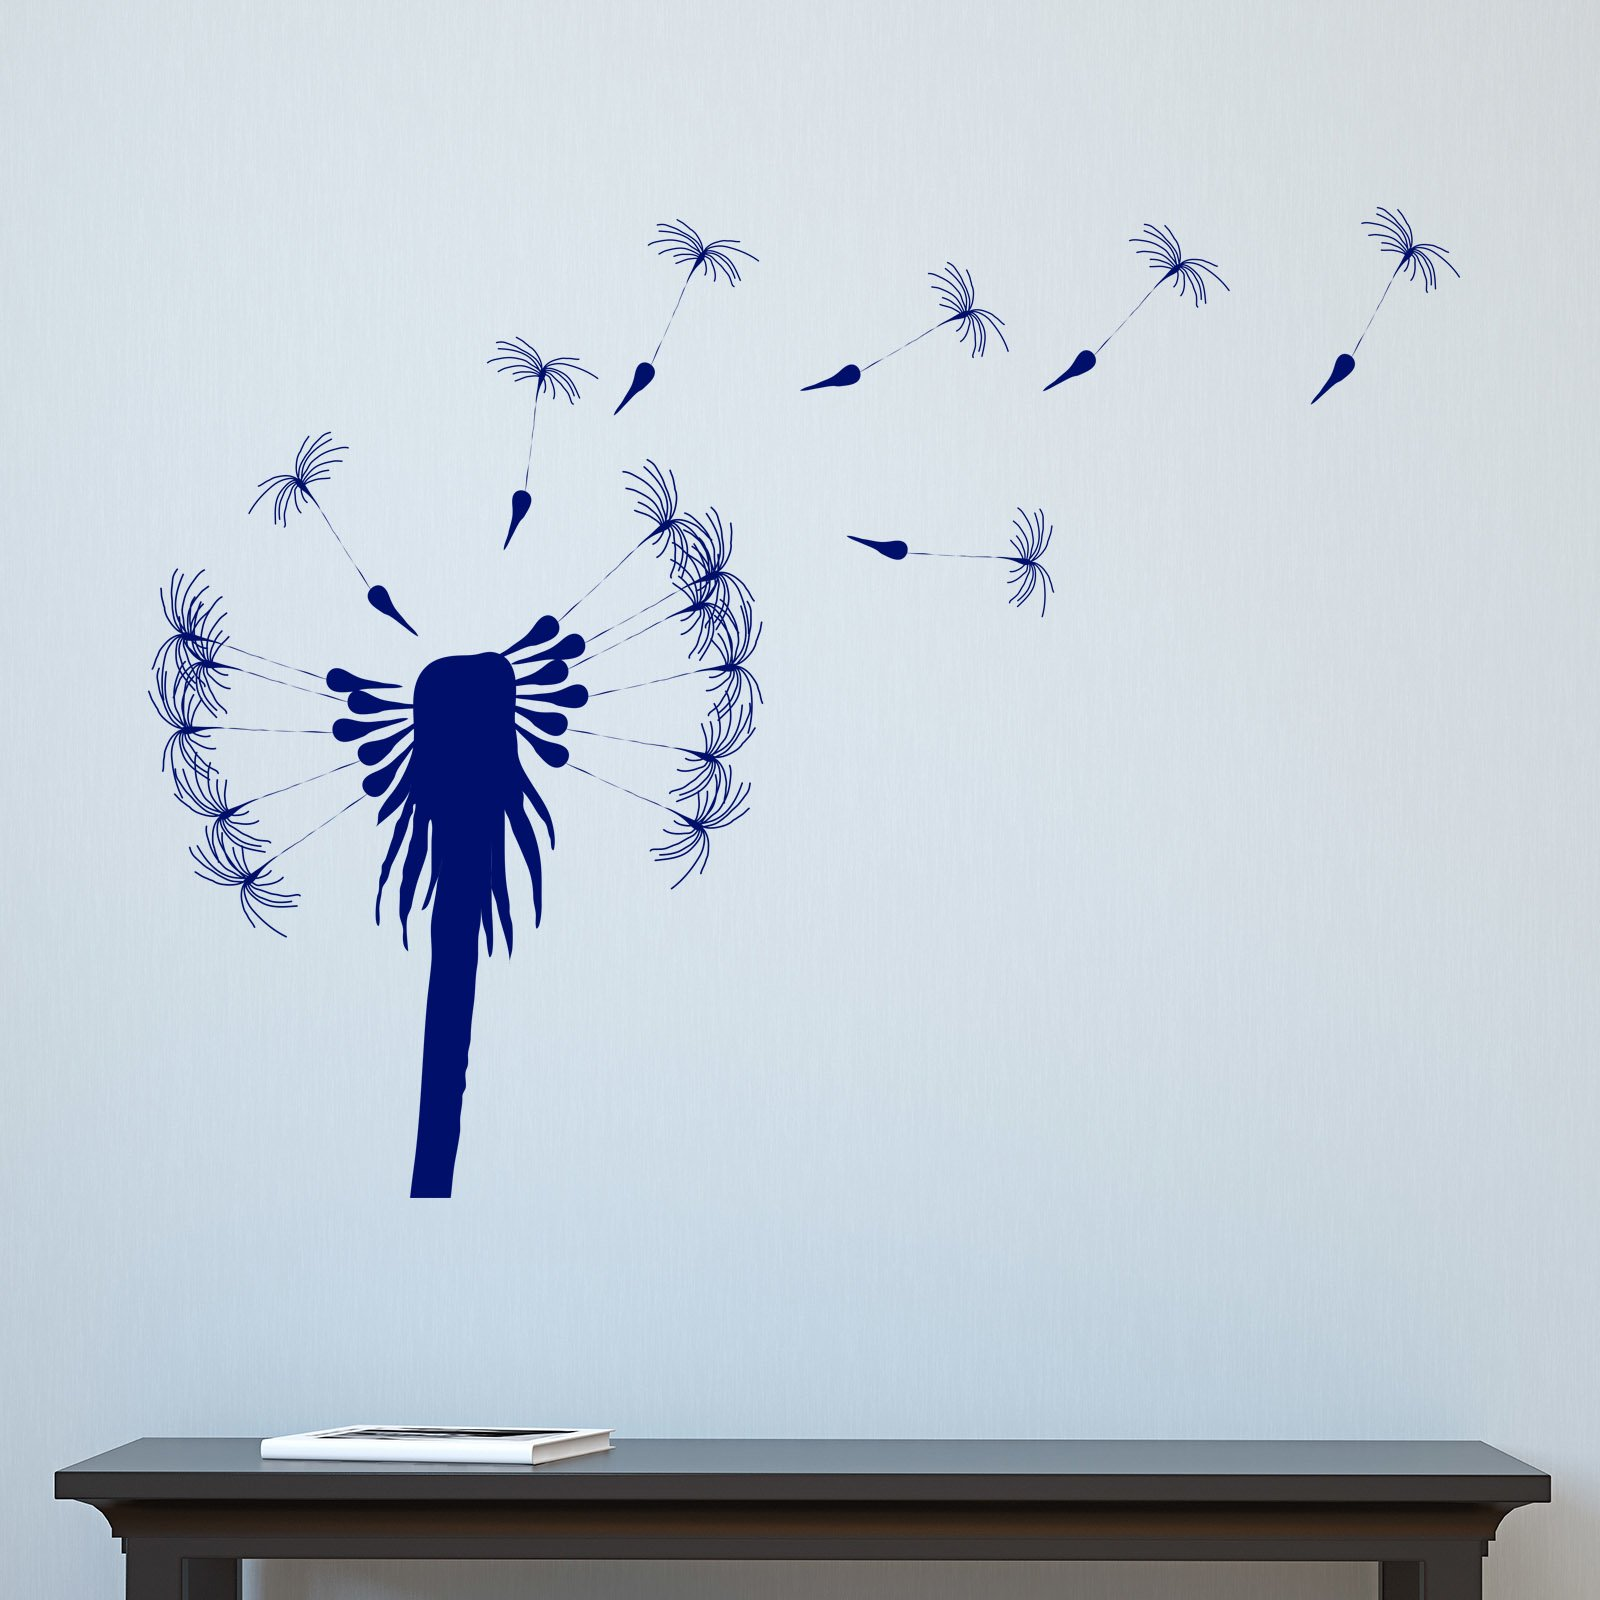 Dandelion seeds floating in wind wall sticker world of wall stickers amipublicfo Gallery